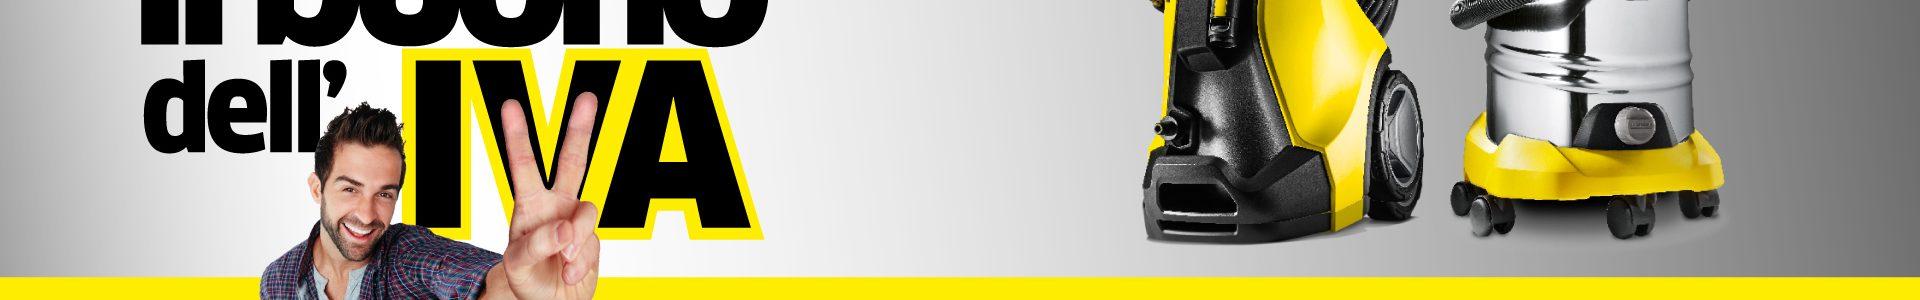 Kärcher  promo ti rimborsa IVA con coupon